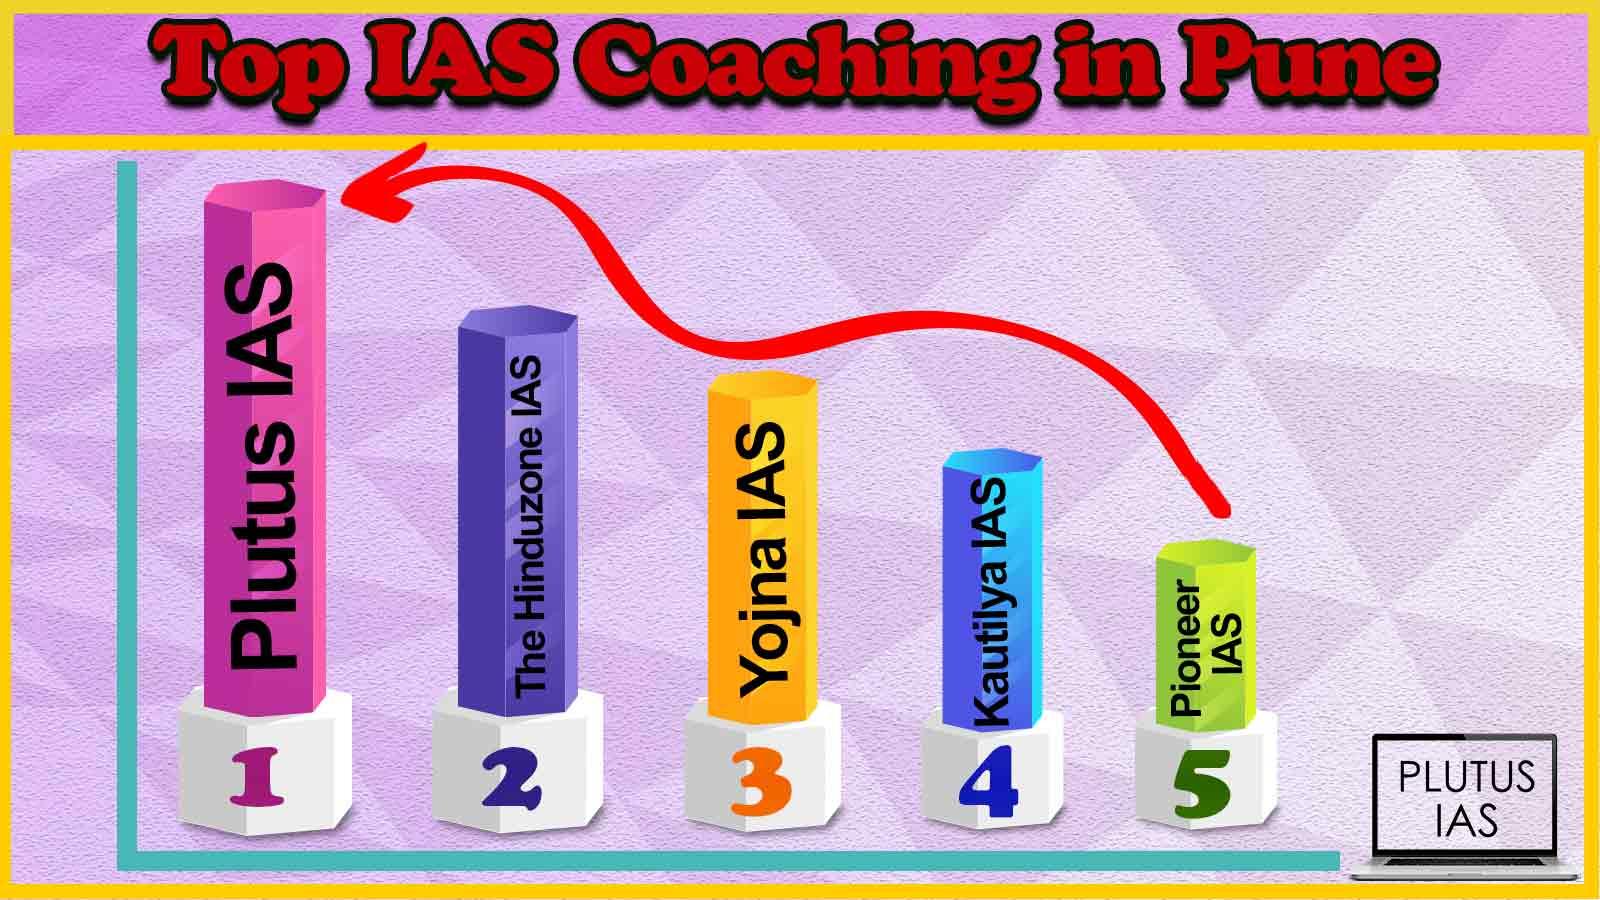 Best 10 IAS Coaching in Pune